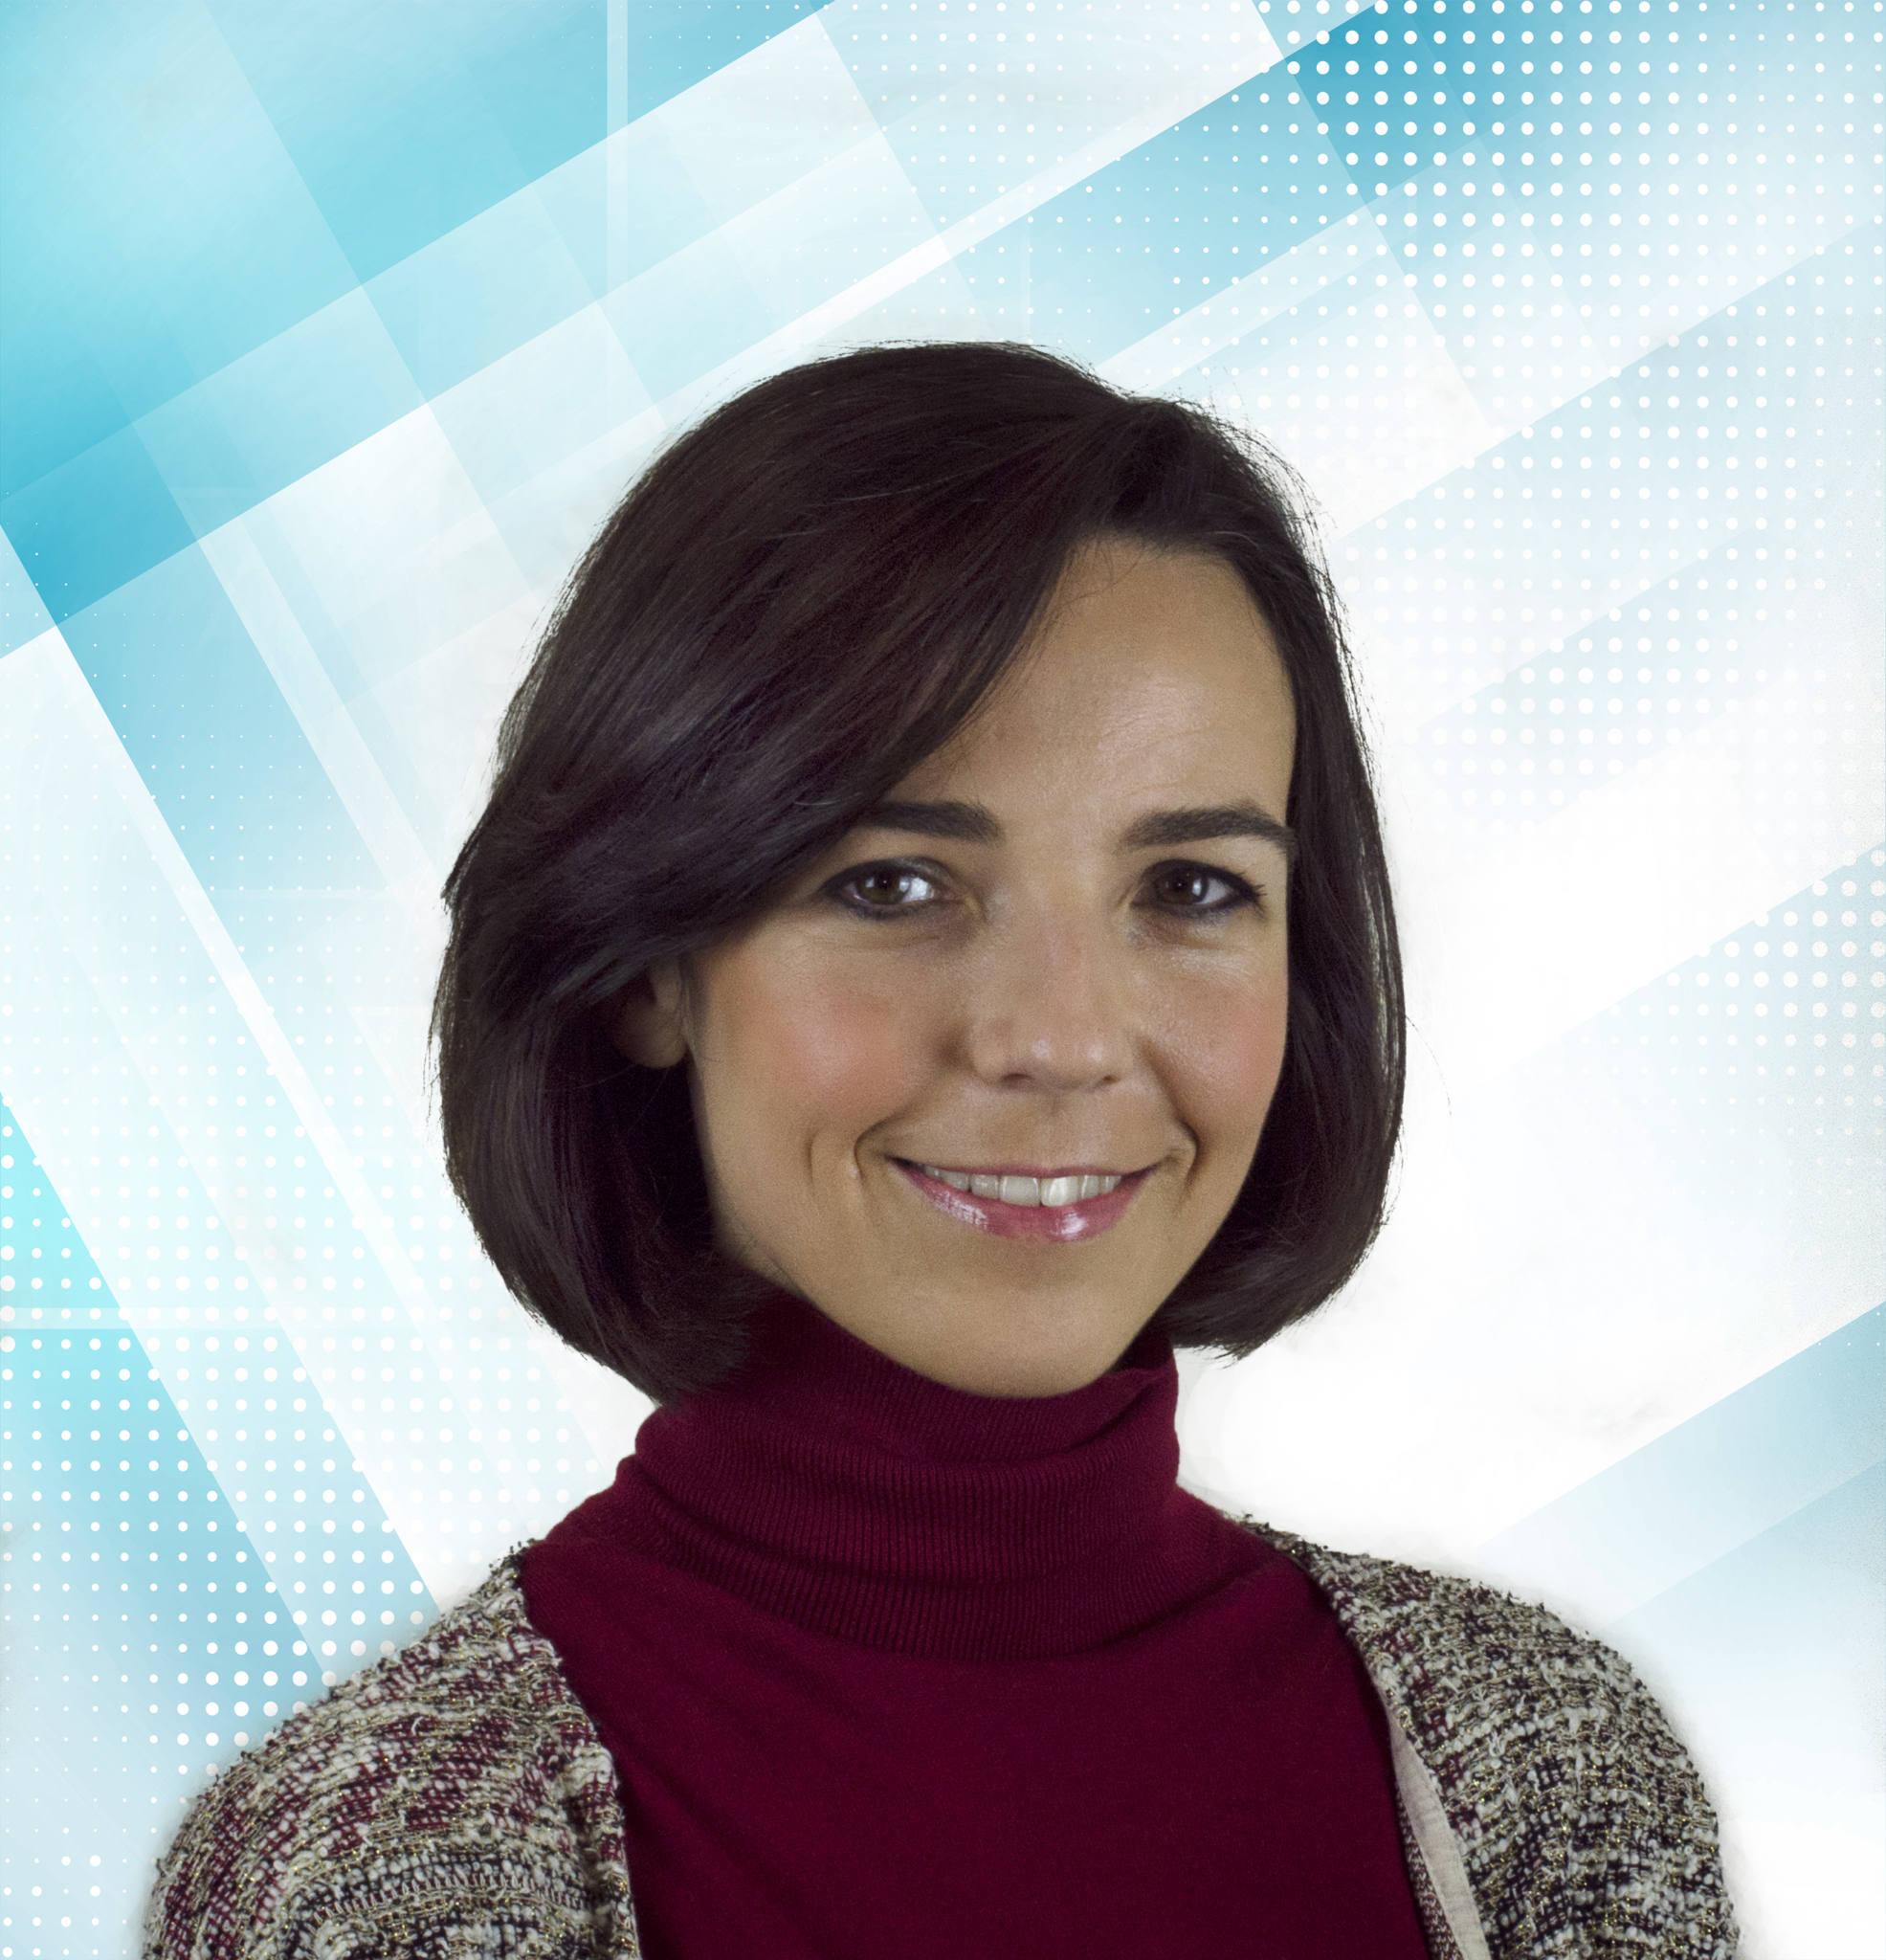 Jara Martínez